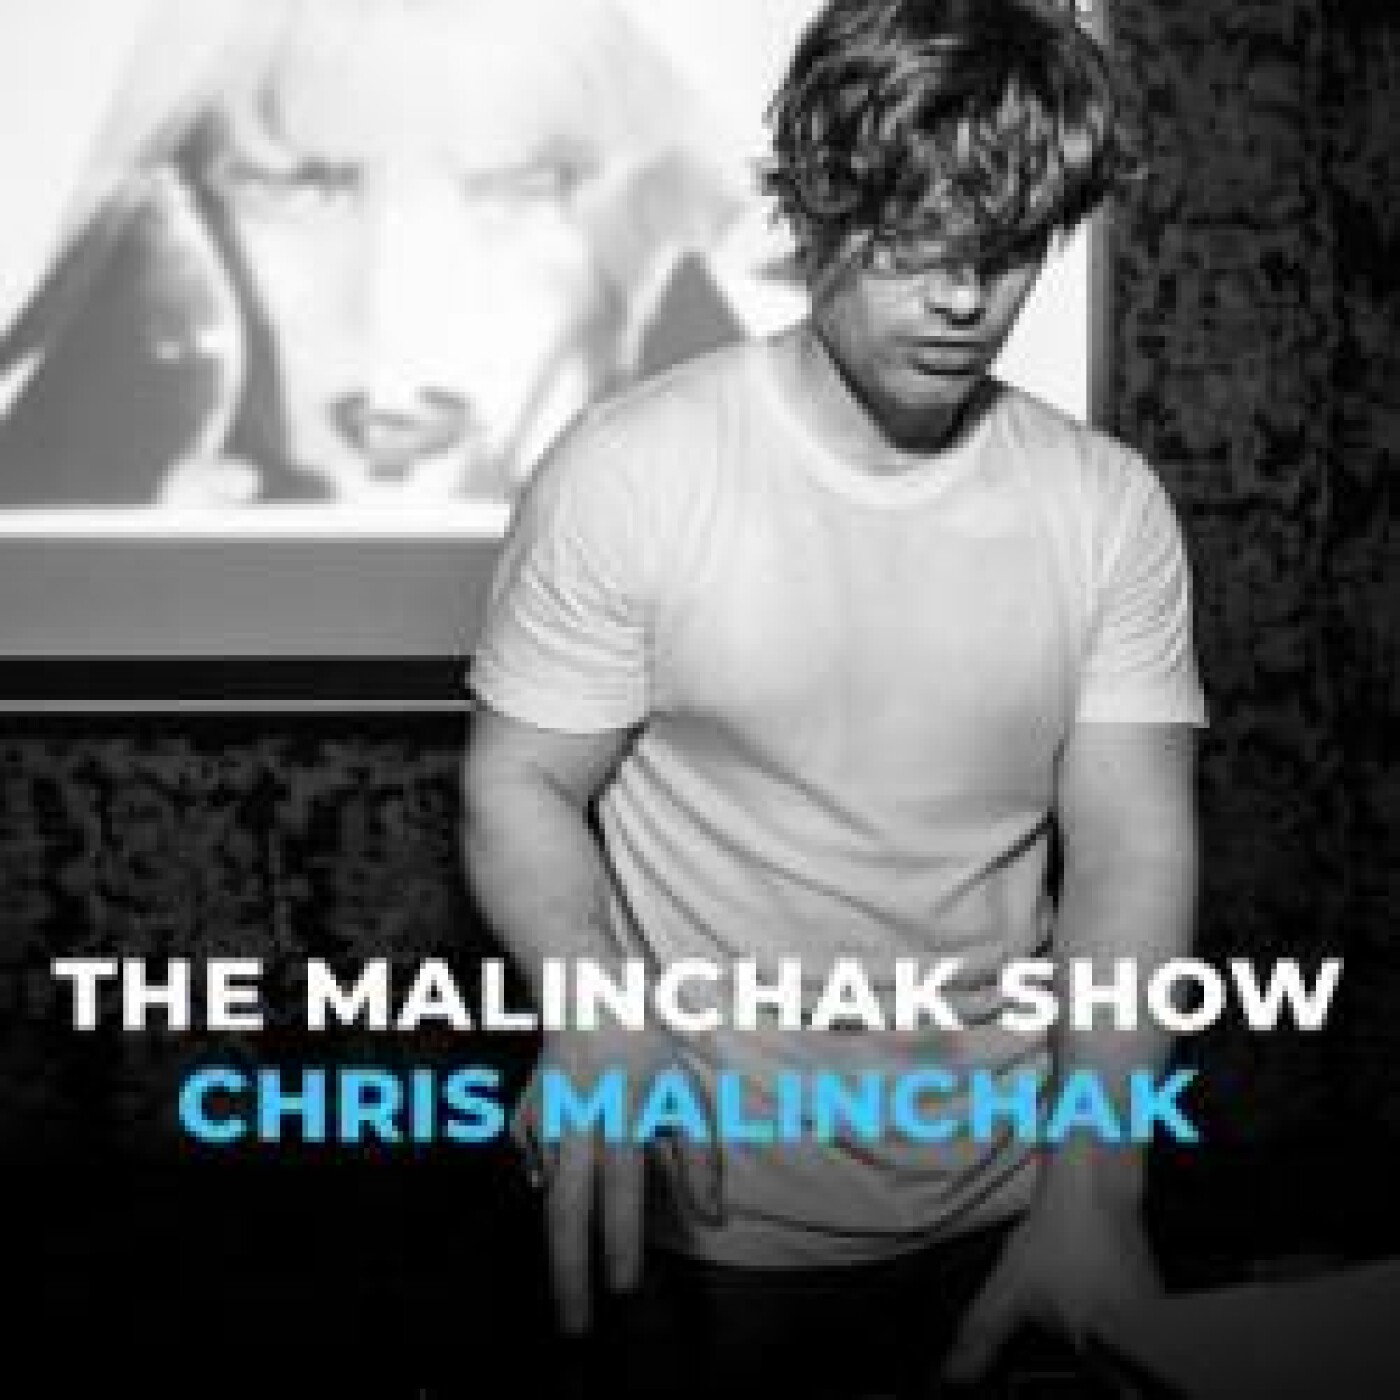 THE MALINCHAK SHOW DU 23 JUIN 2021